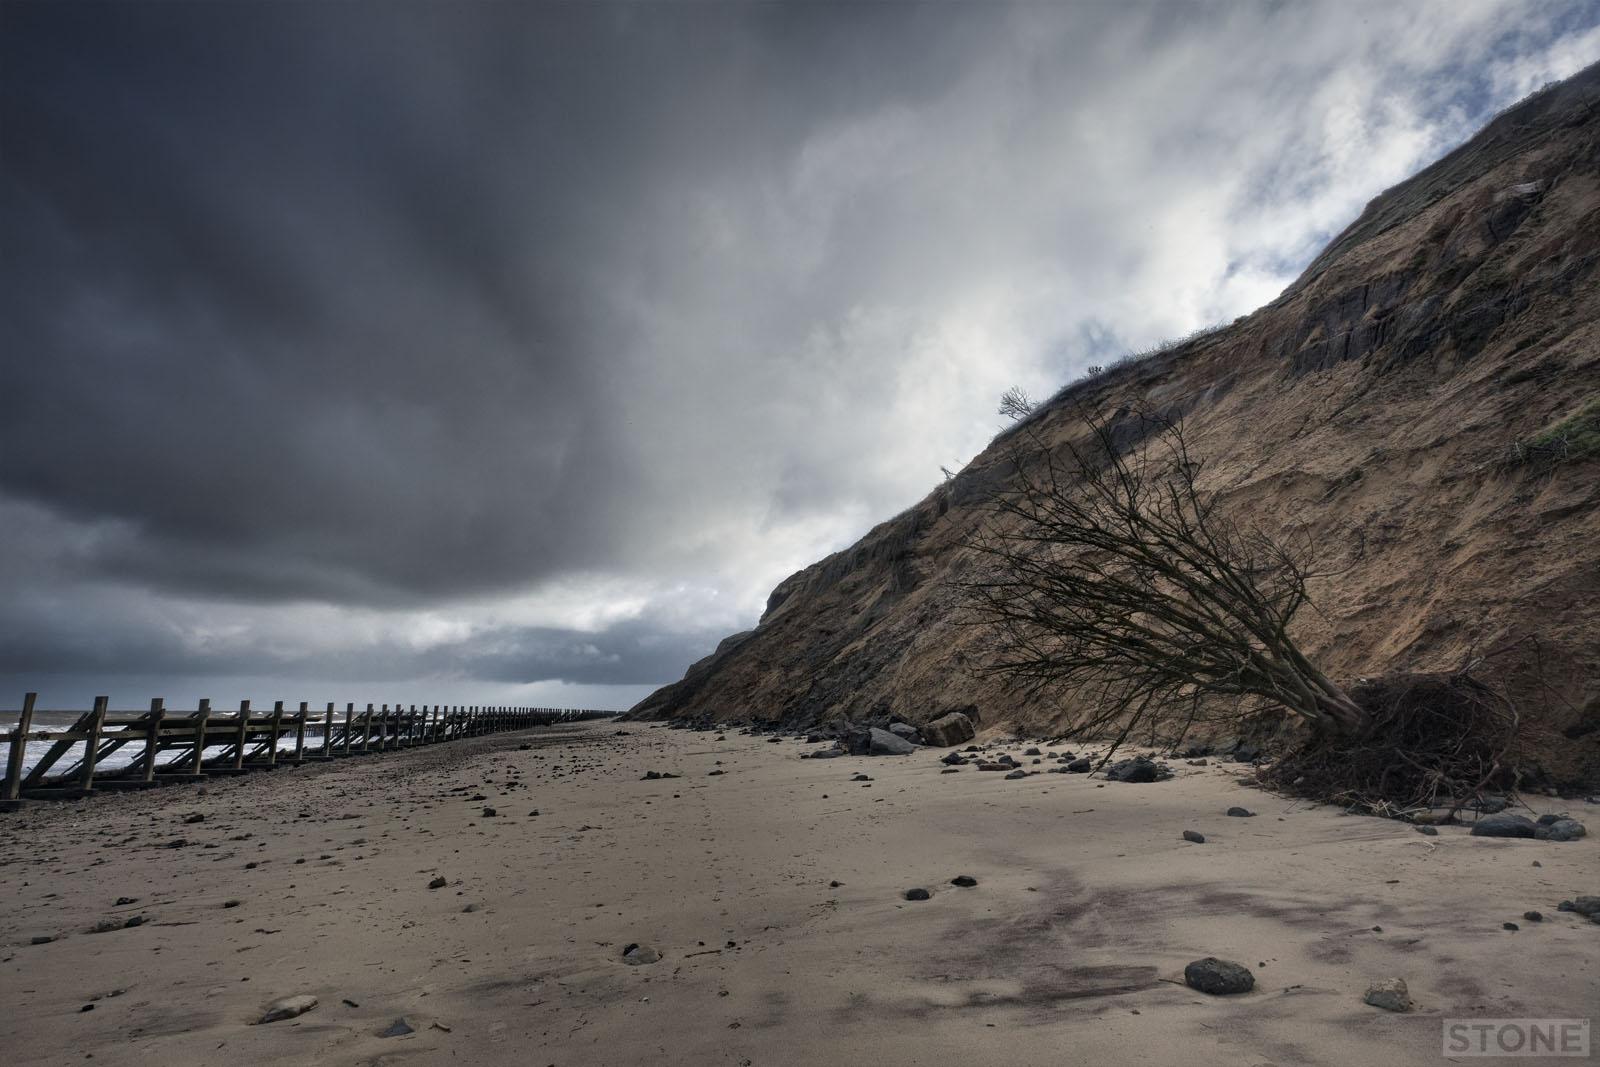 Coasting: Trimingham – On the beach